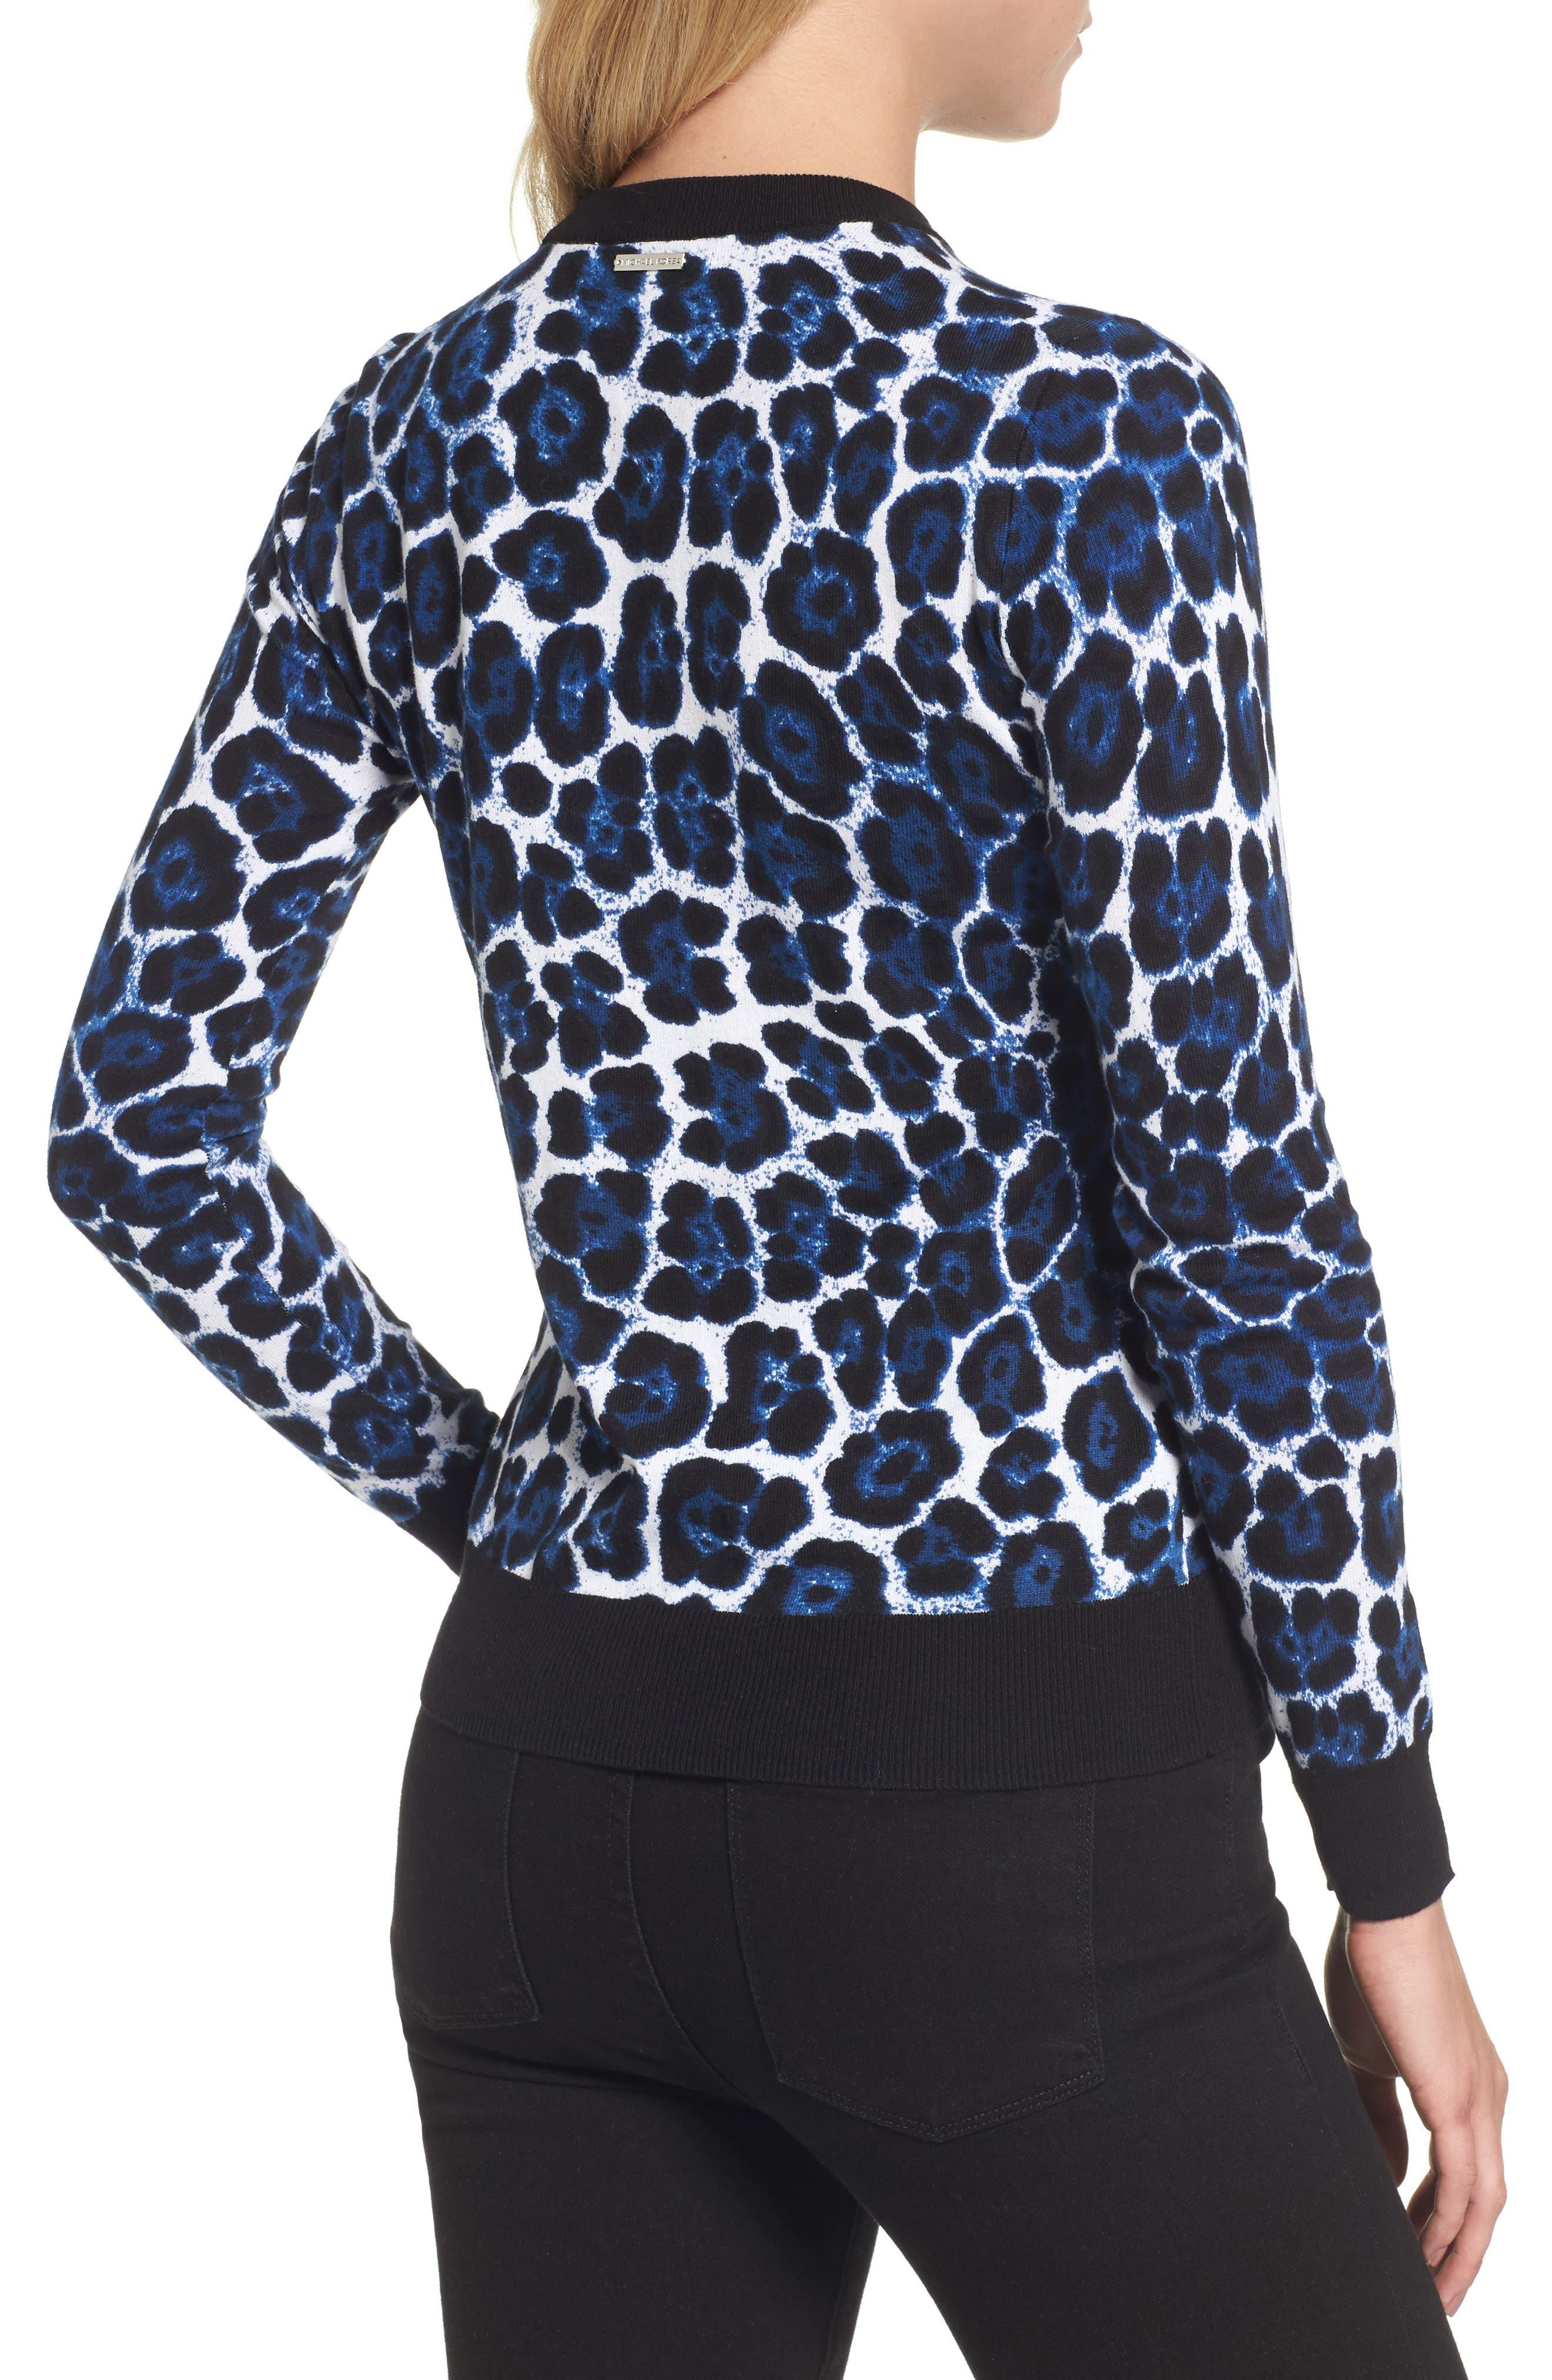 Cheetah Print Sweater,                             Alternate thumbnail 2, color,                             403